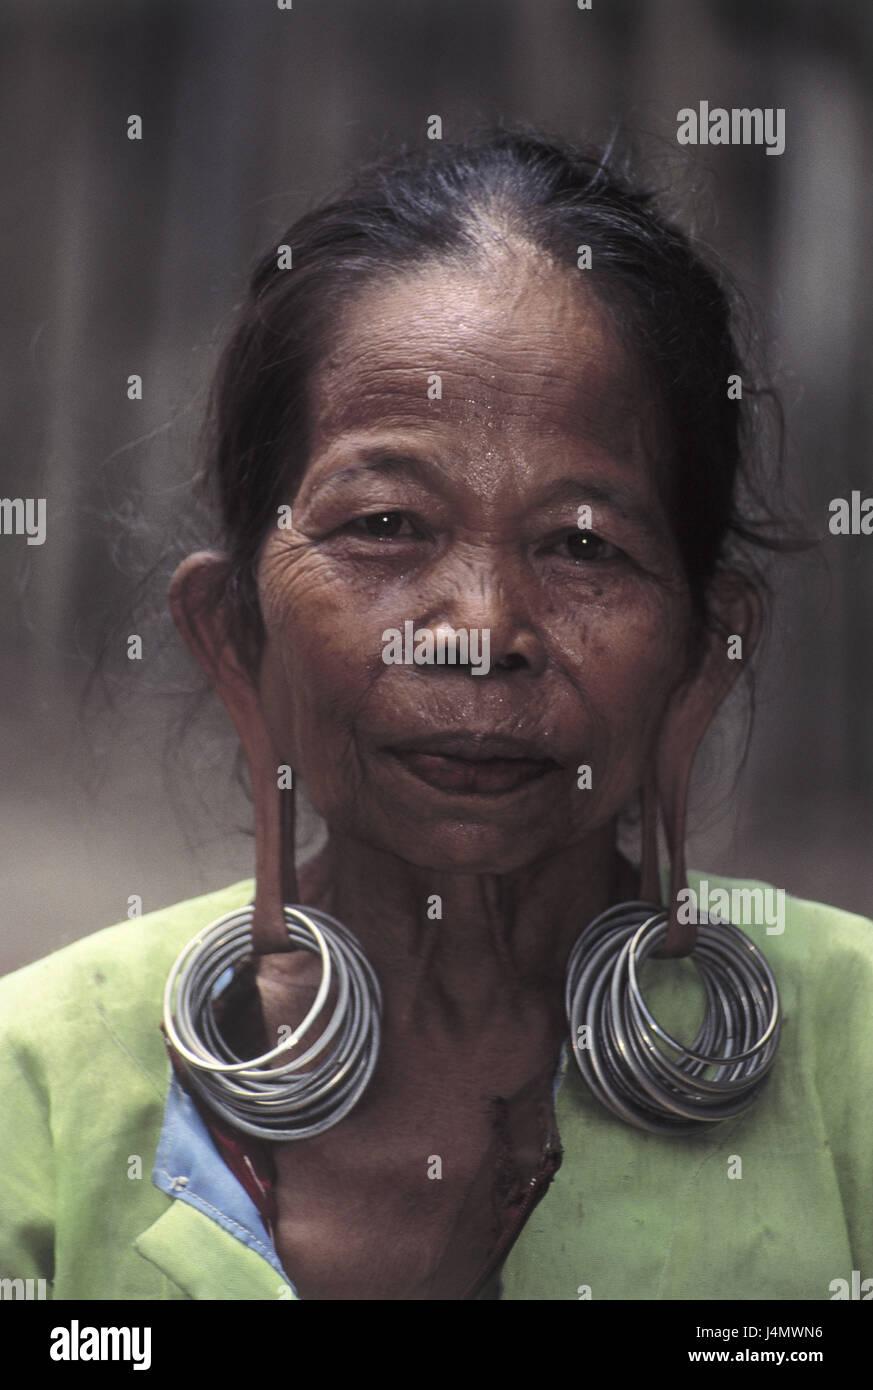 Indonesien, Insel Borneo, primitive Rasse, Kenyah, Frau